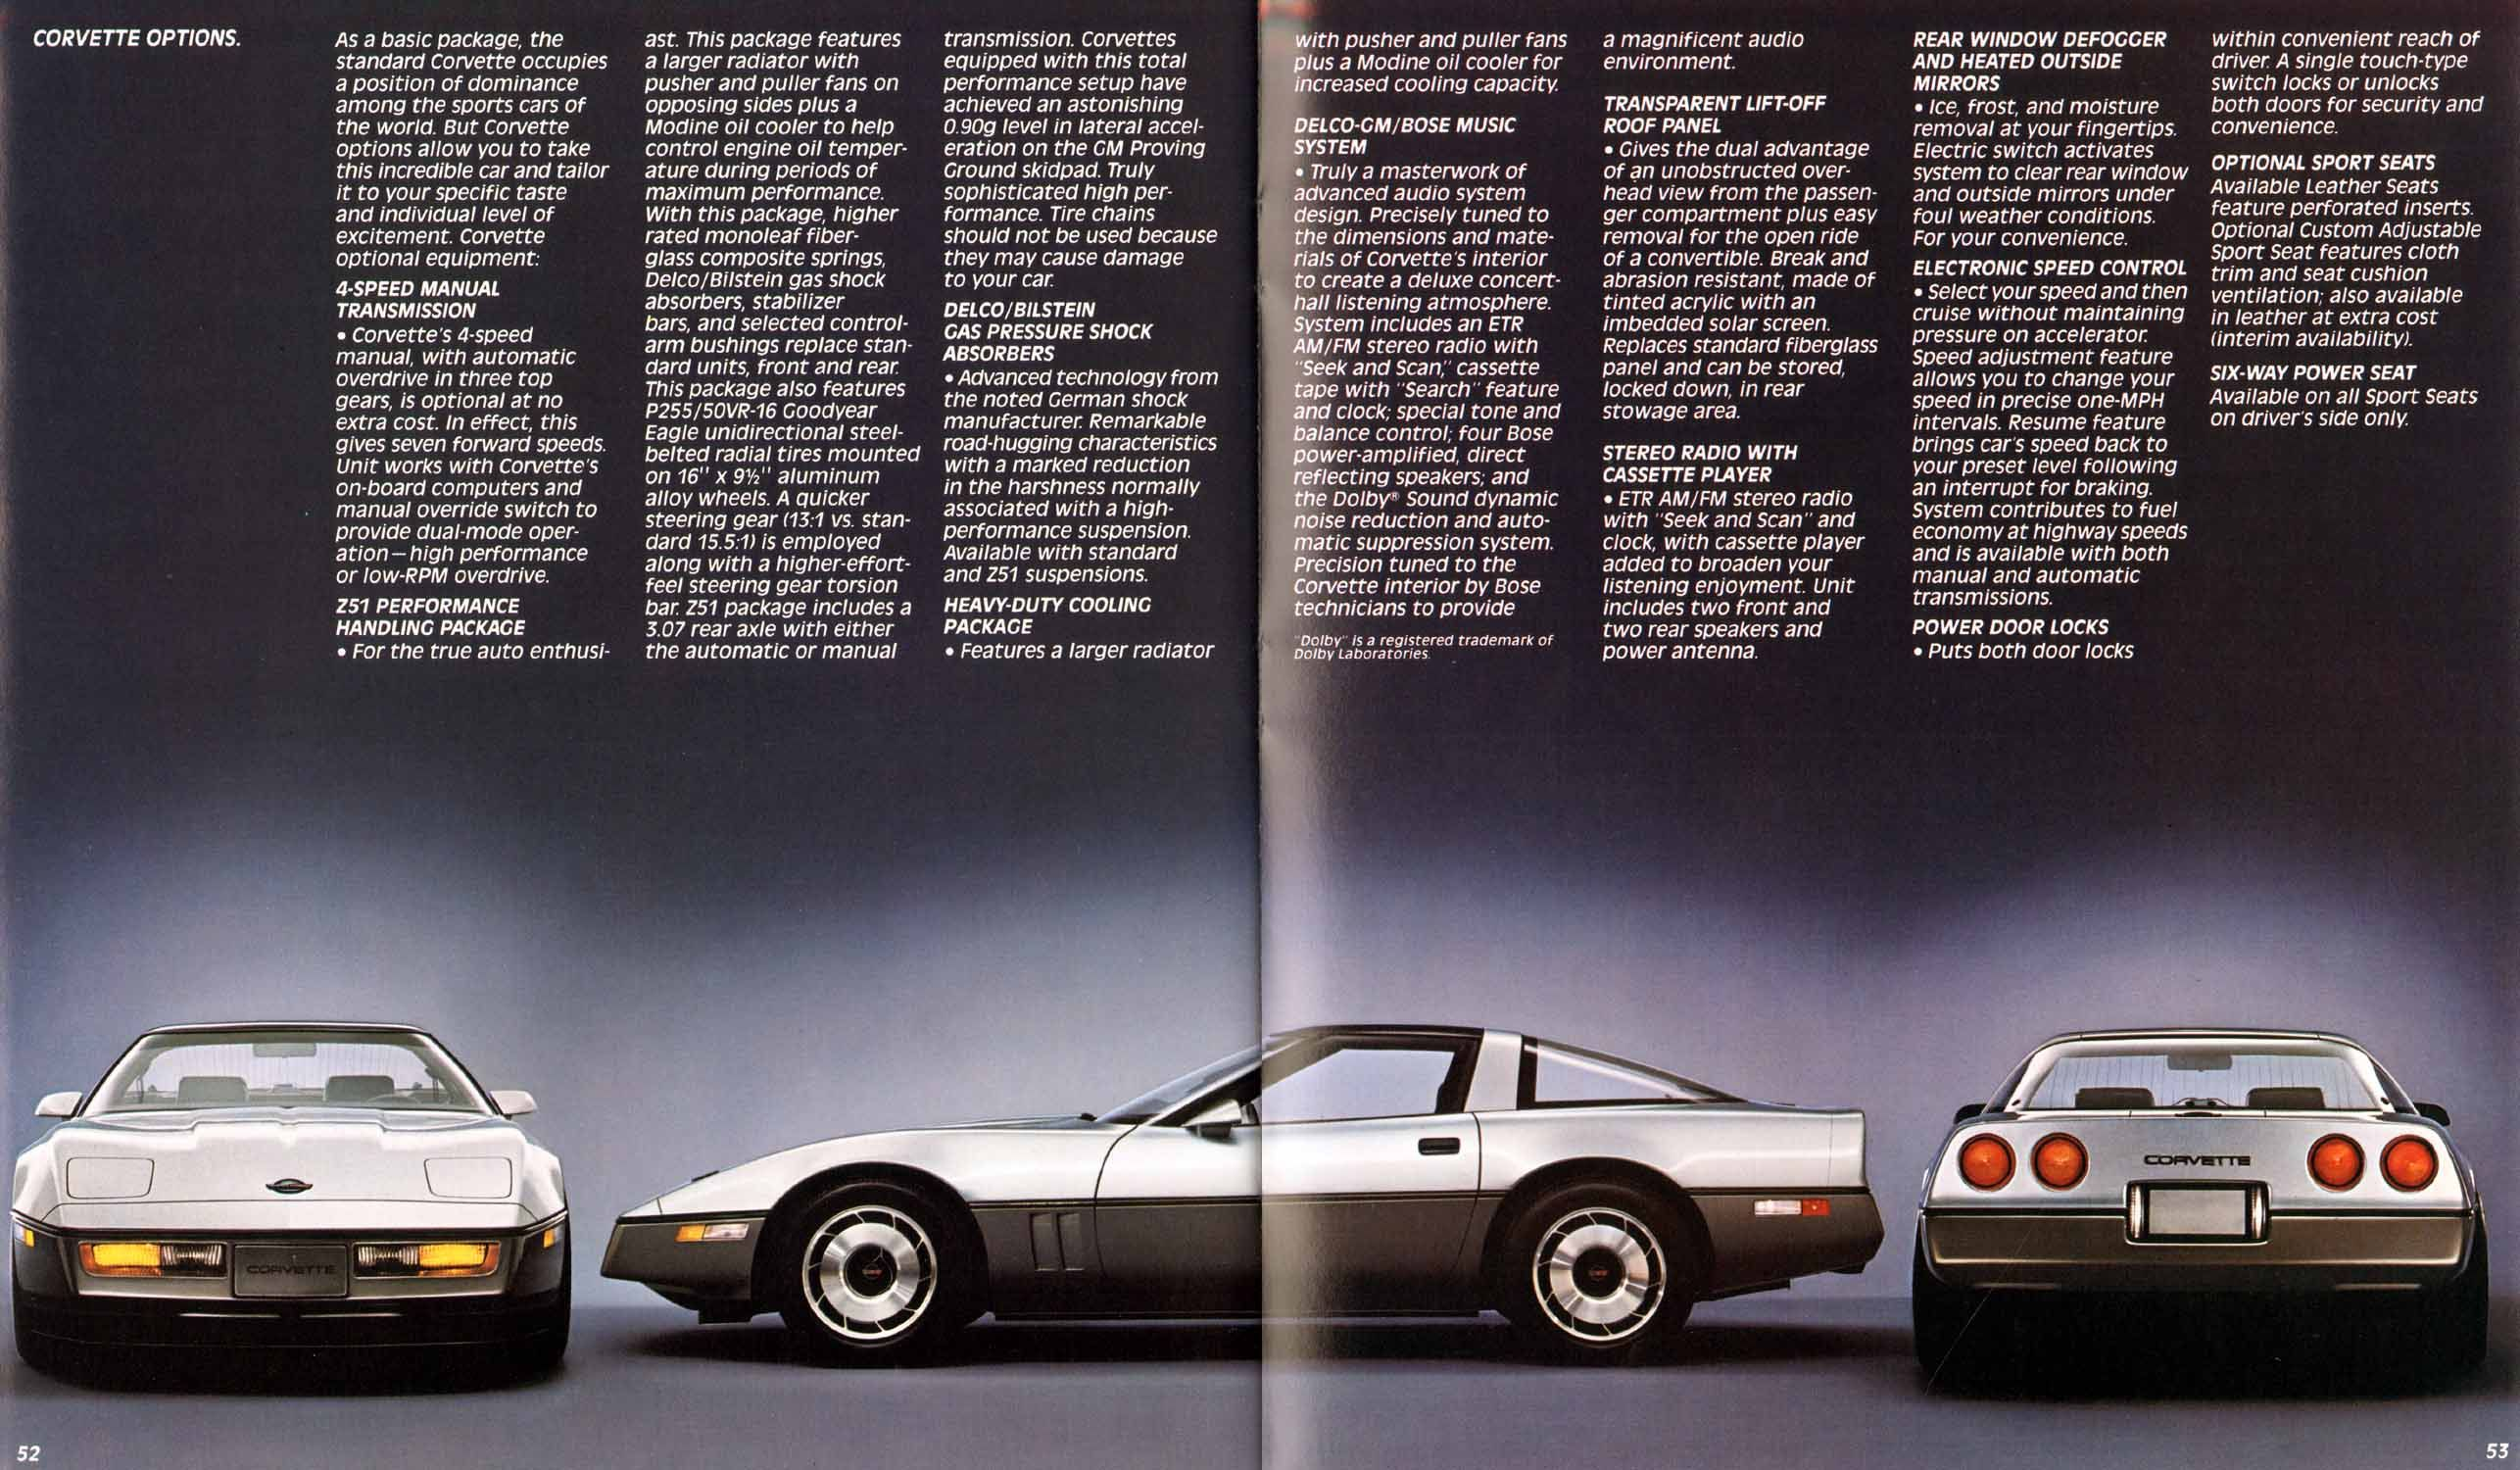 1985 C4 Corvette Image Gallery Pictures Automoviles